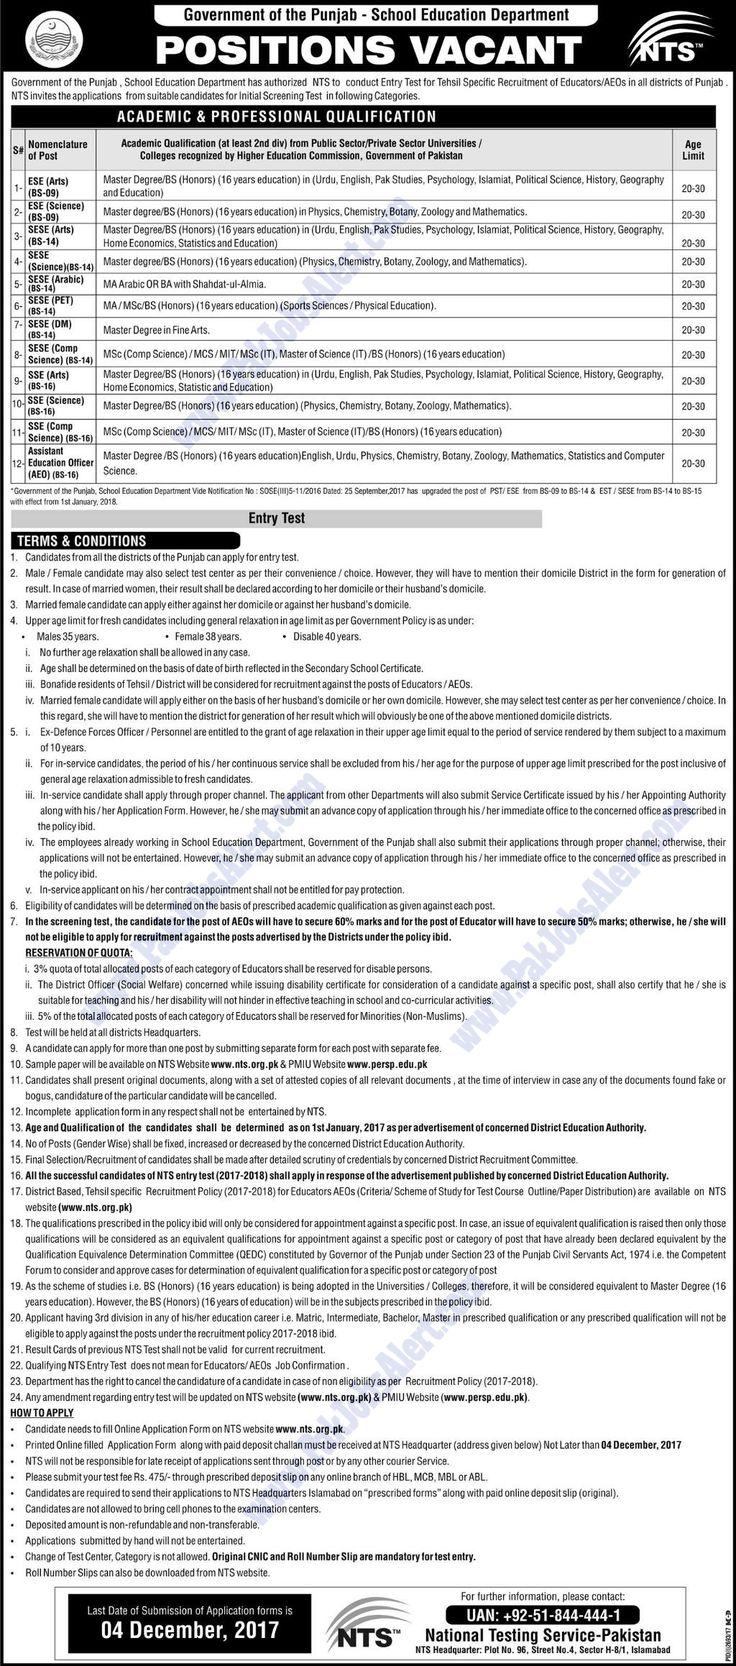 Latest PSED Jobs for Educators 16000+ Vacancies. Punjab School Education Department